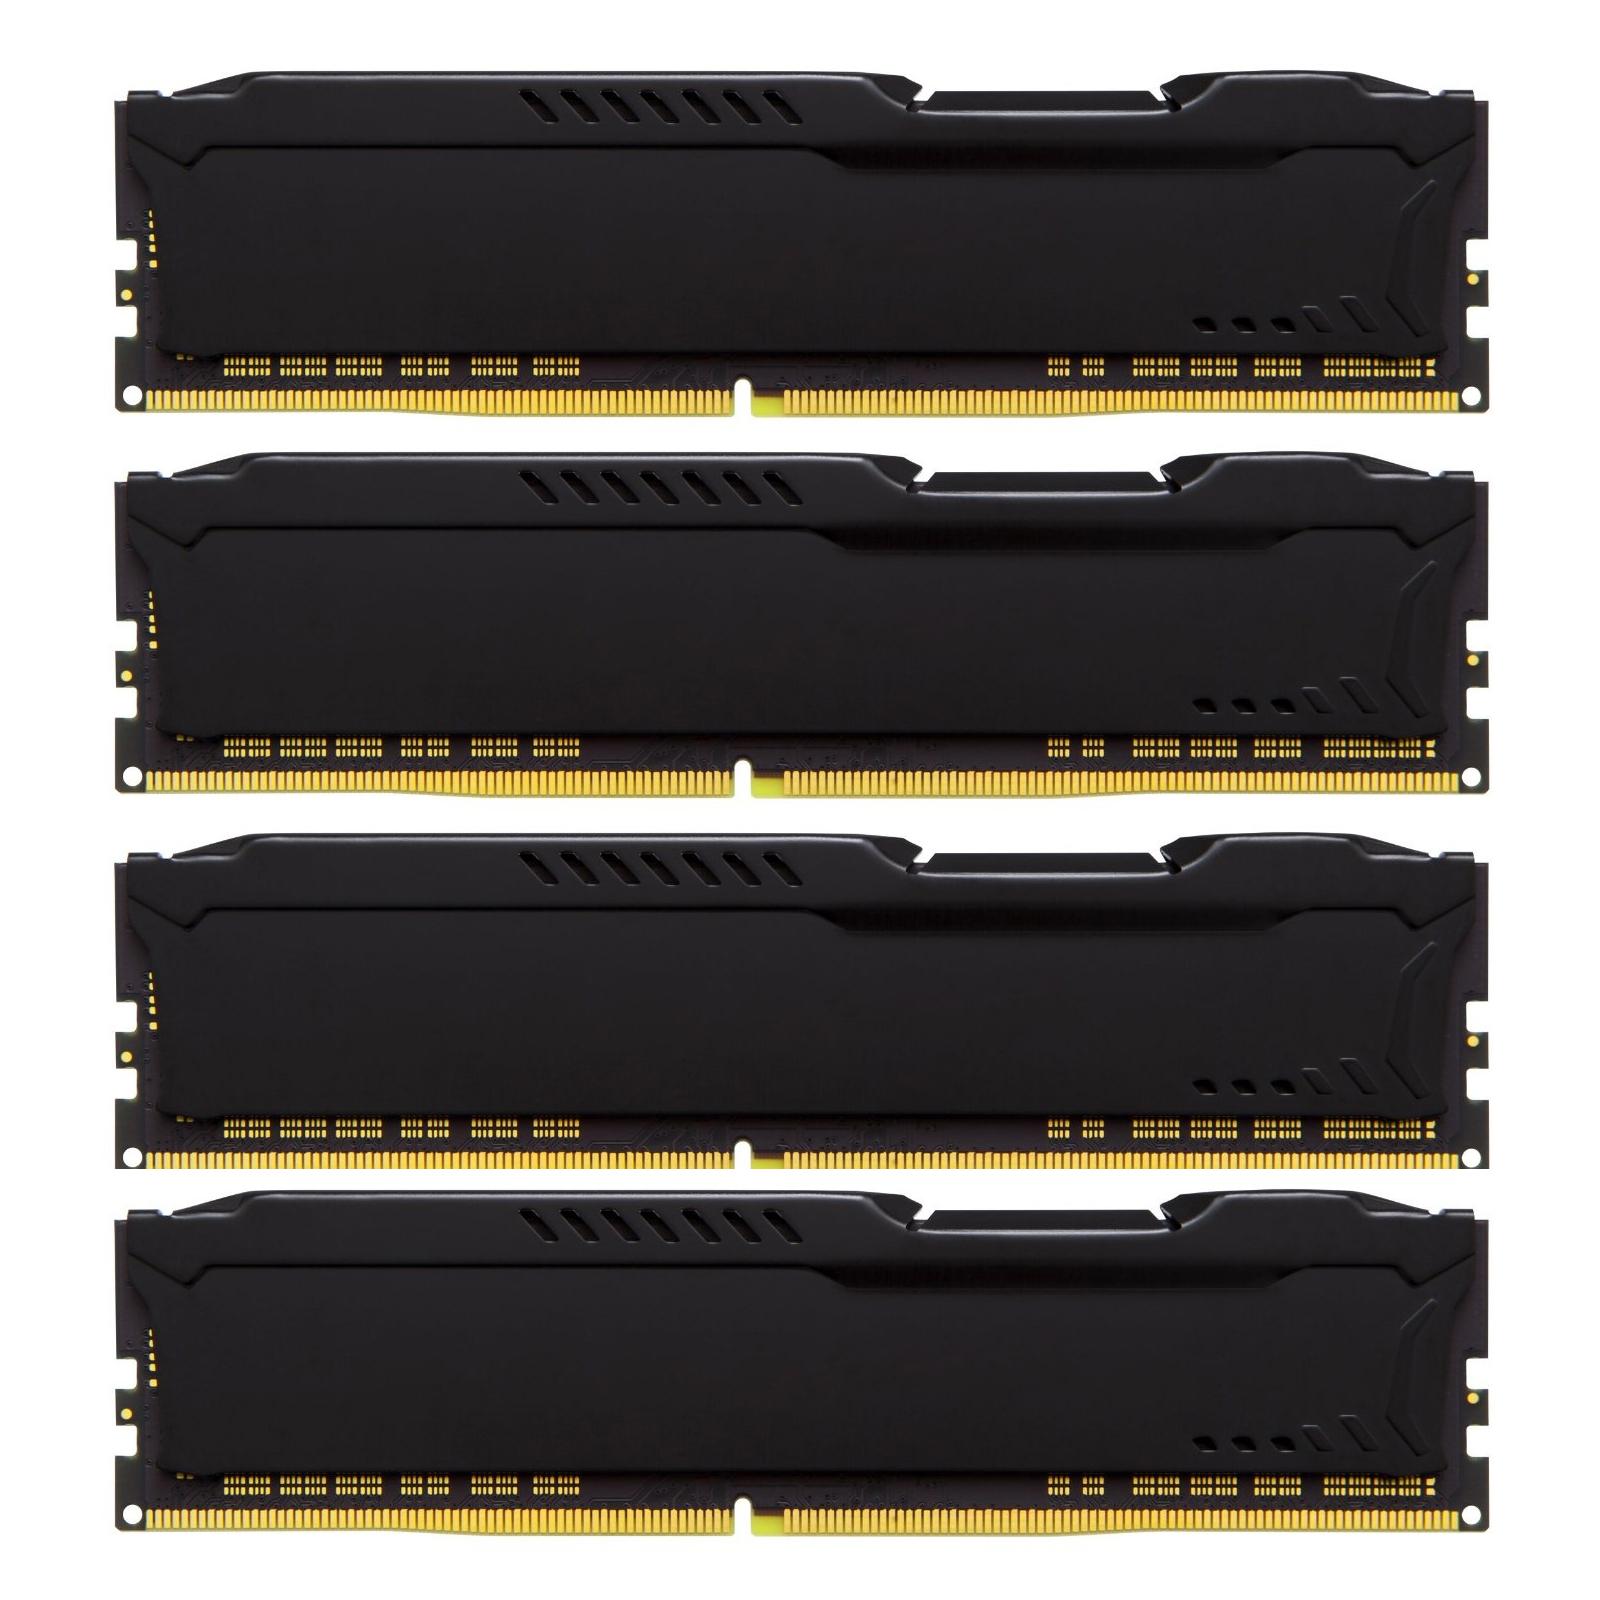 Модуль памяти для компьютера DDR4 64GB (4x16GB) 2400 MHz HyperX FURY Black Kingston (HX424C15FBK4/64) изображение 3